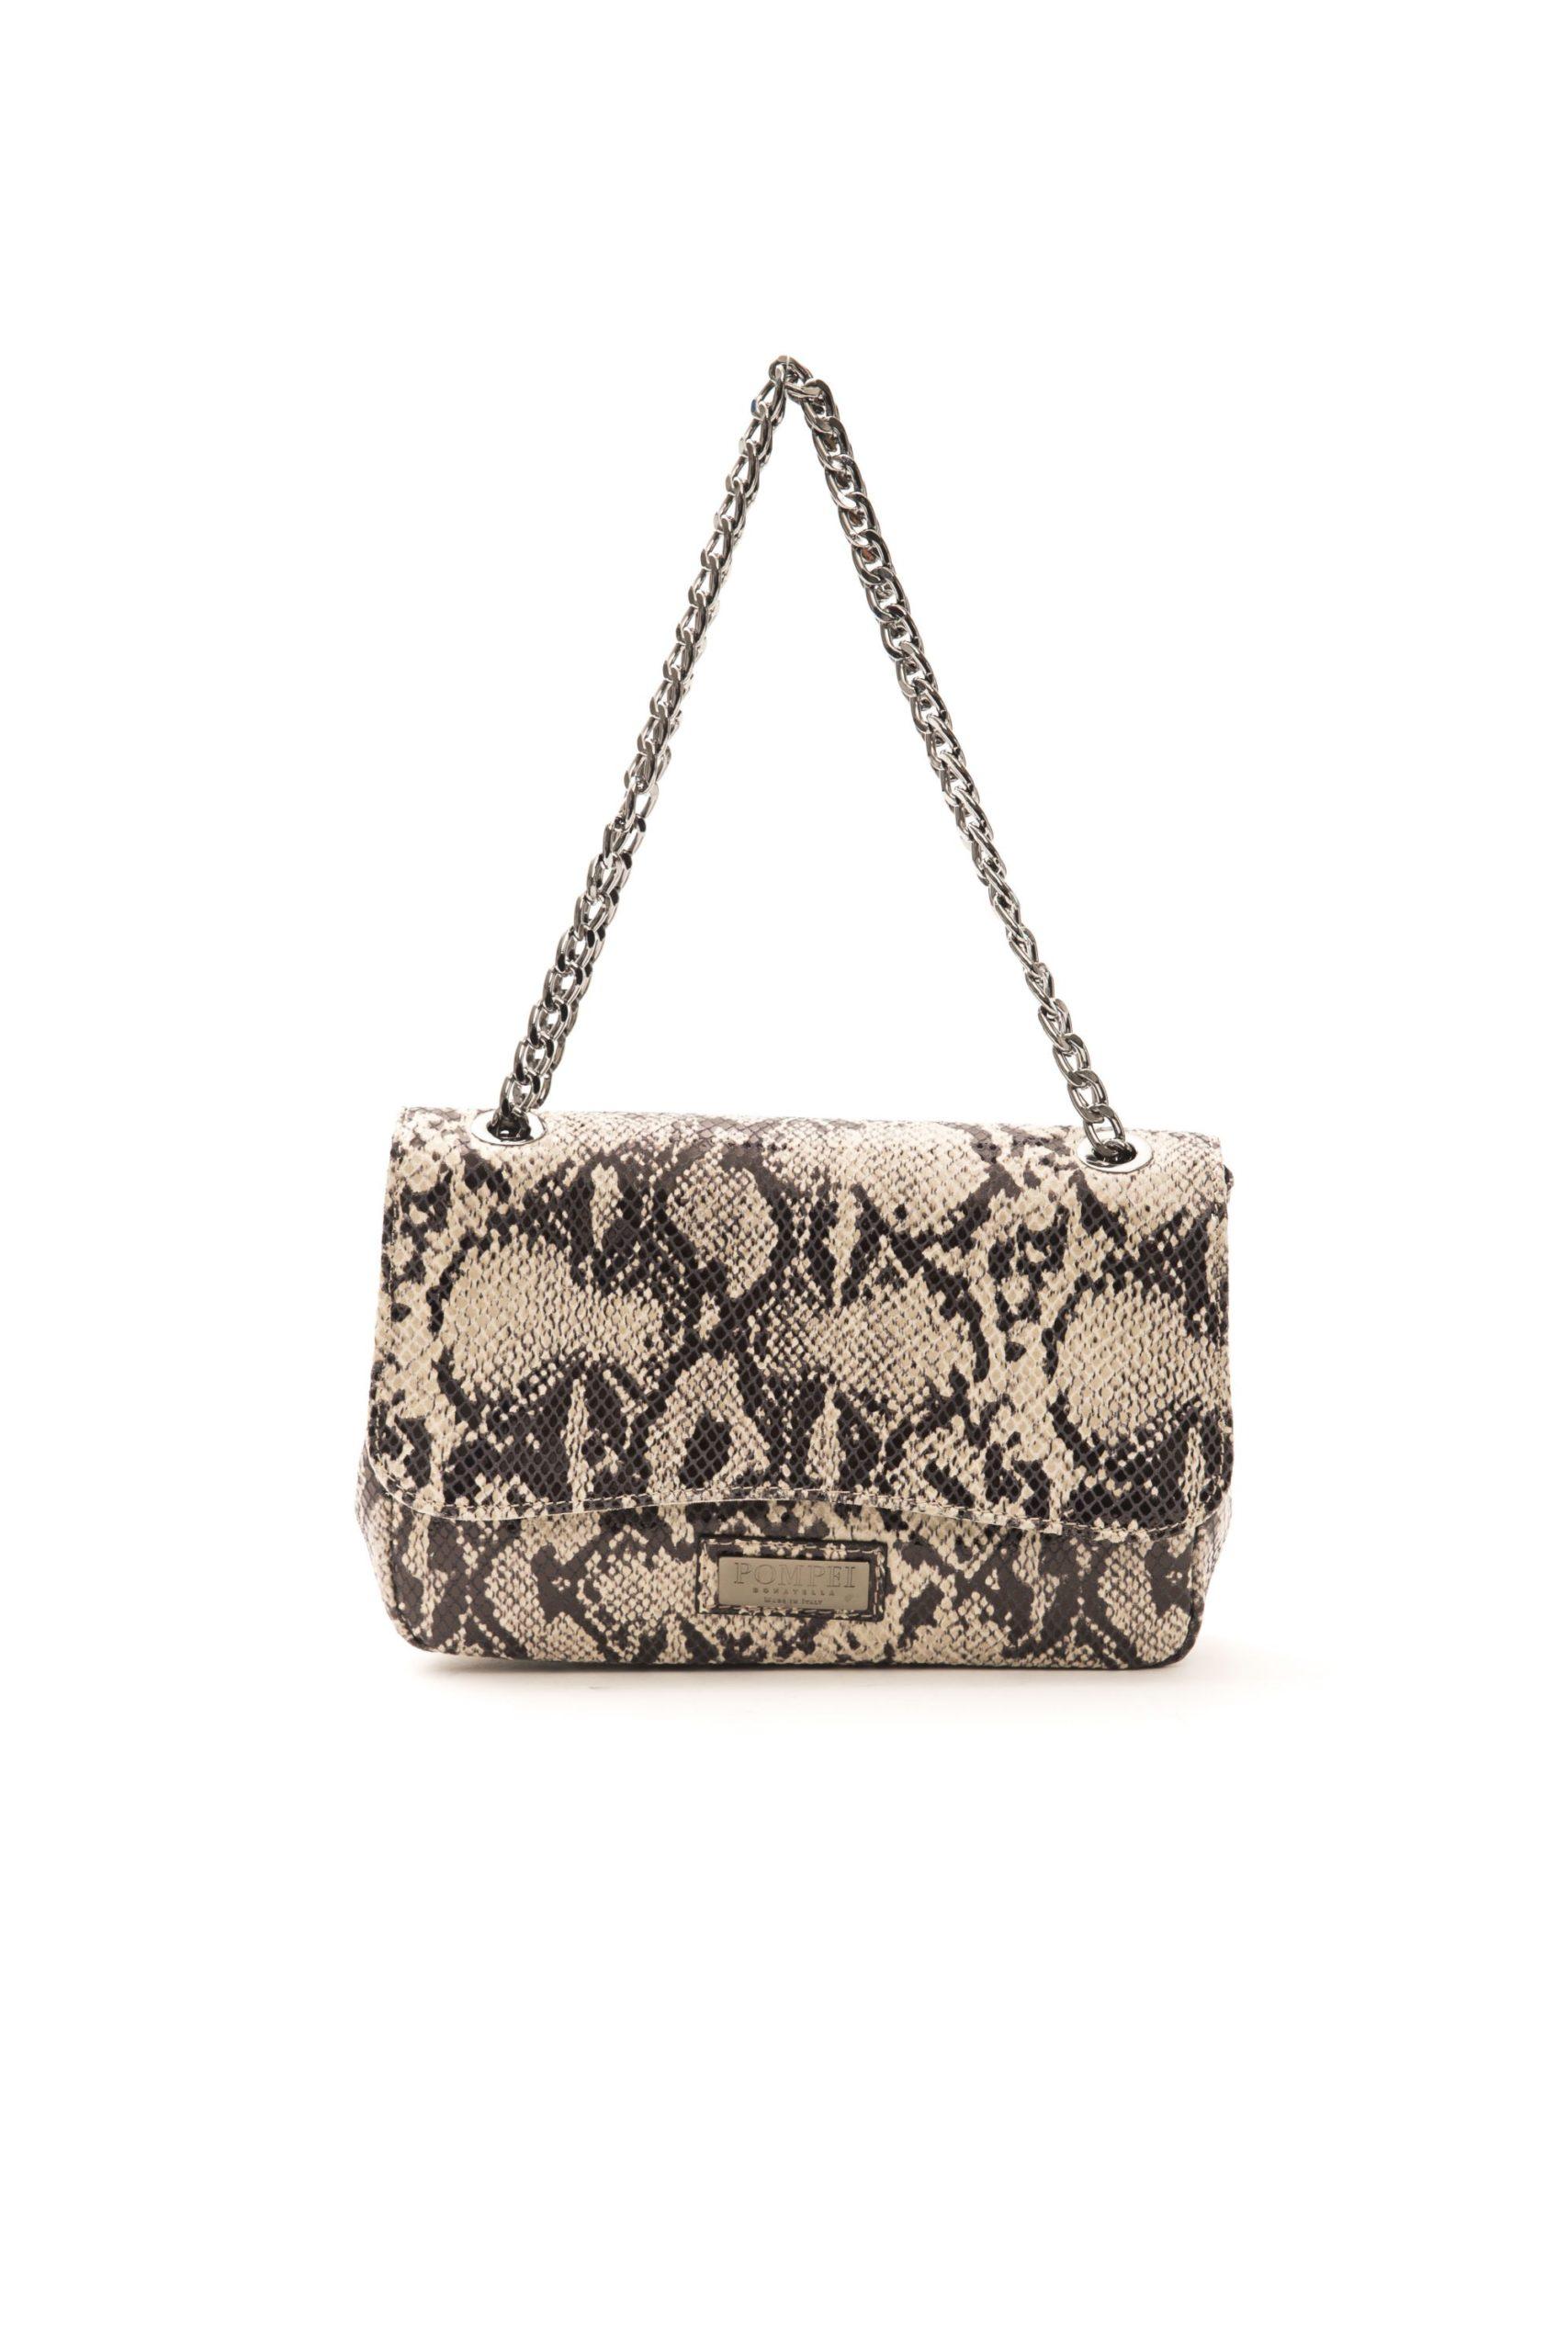 Pompei Donatella Women's Roccia Stone Crossbody Bag Grey PO1005103